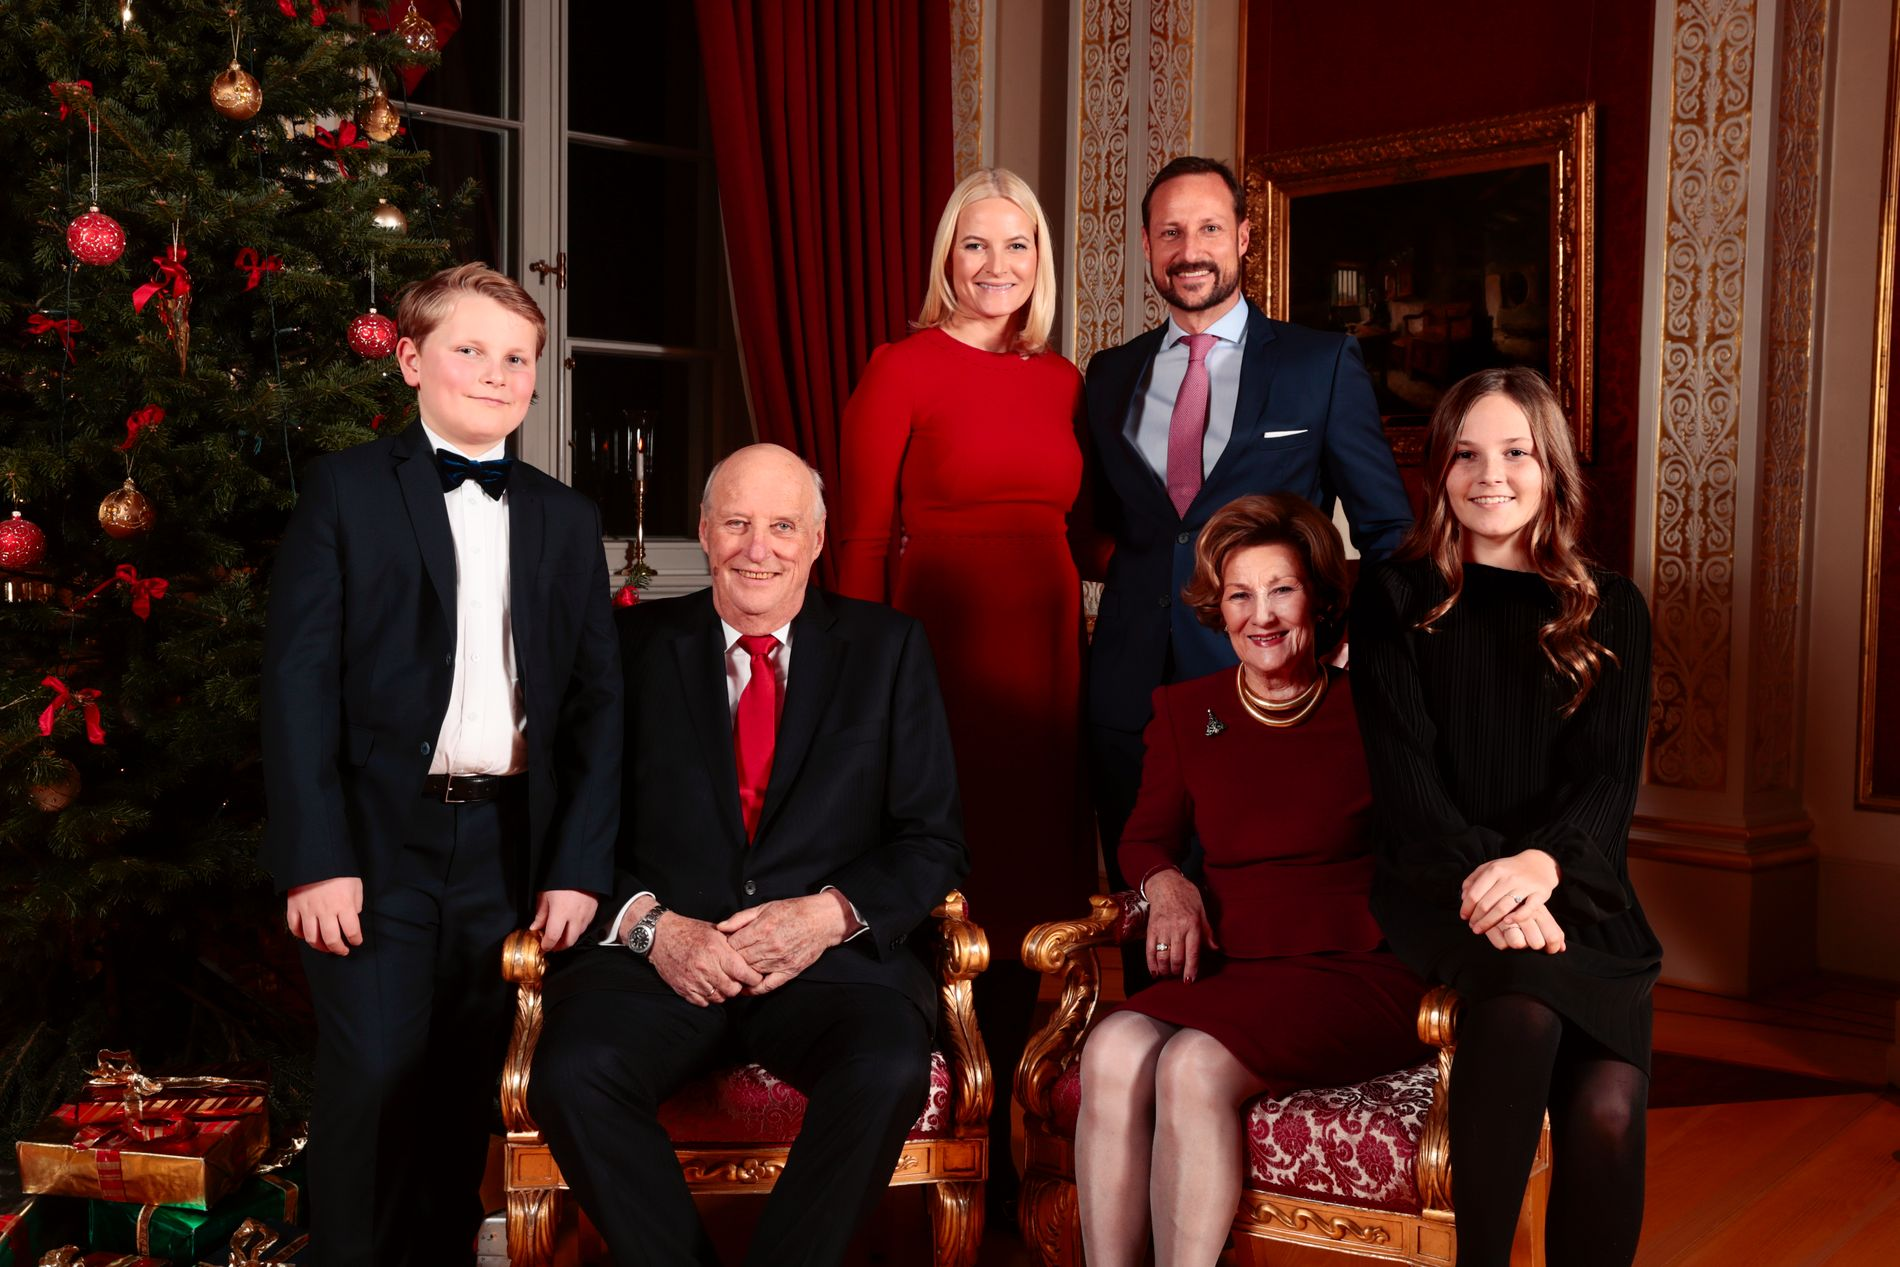 ÅRETS JULEBILDER Kongefamilien stiller til julefotografering. Fra venstre: prins Sverre Magnus, kong Harald, kronprinsesse Mette-Marit, dronning Sonja, kronprins Haakon og prinsesse Ingrid Alexandra på Slottet.